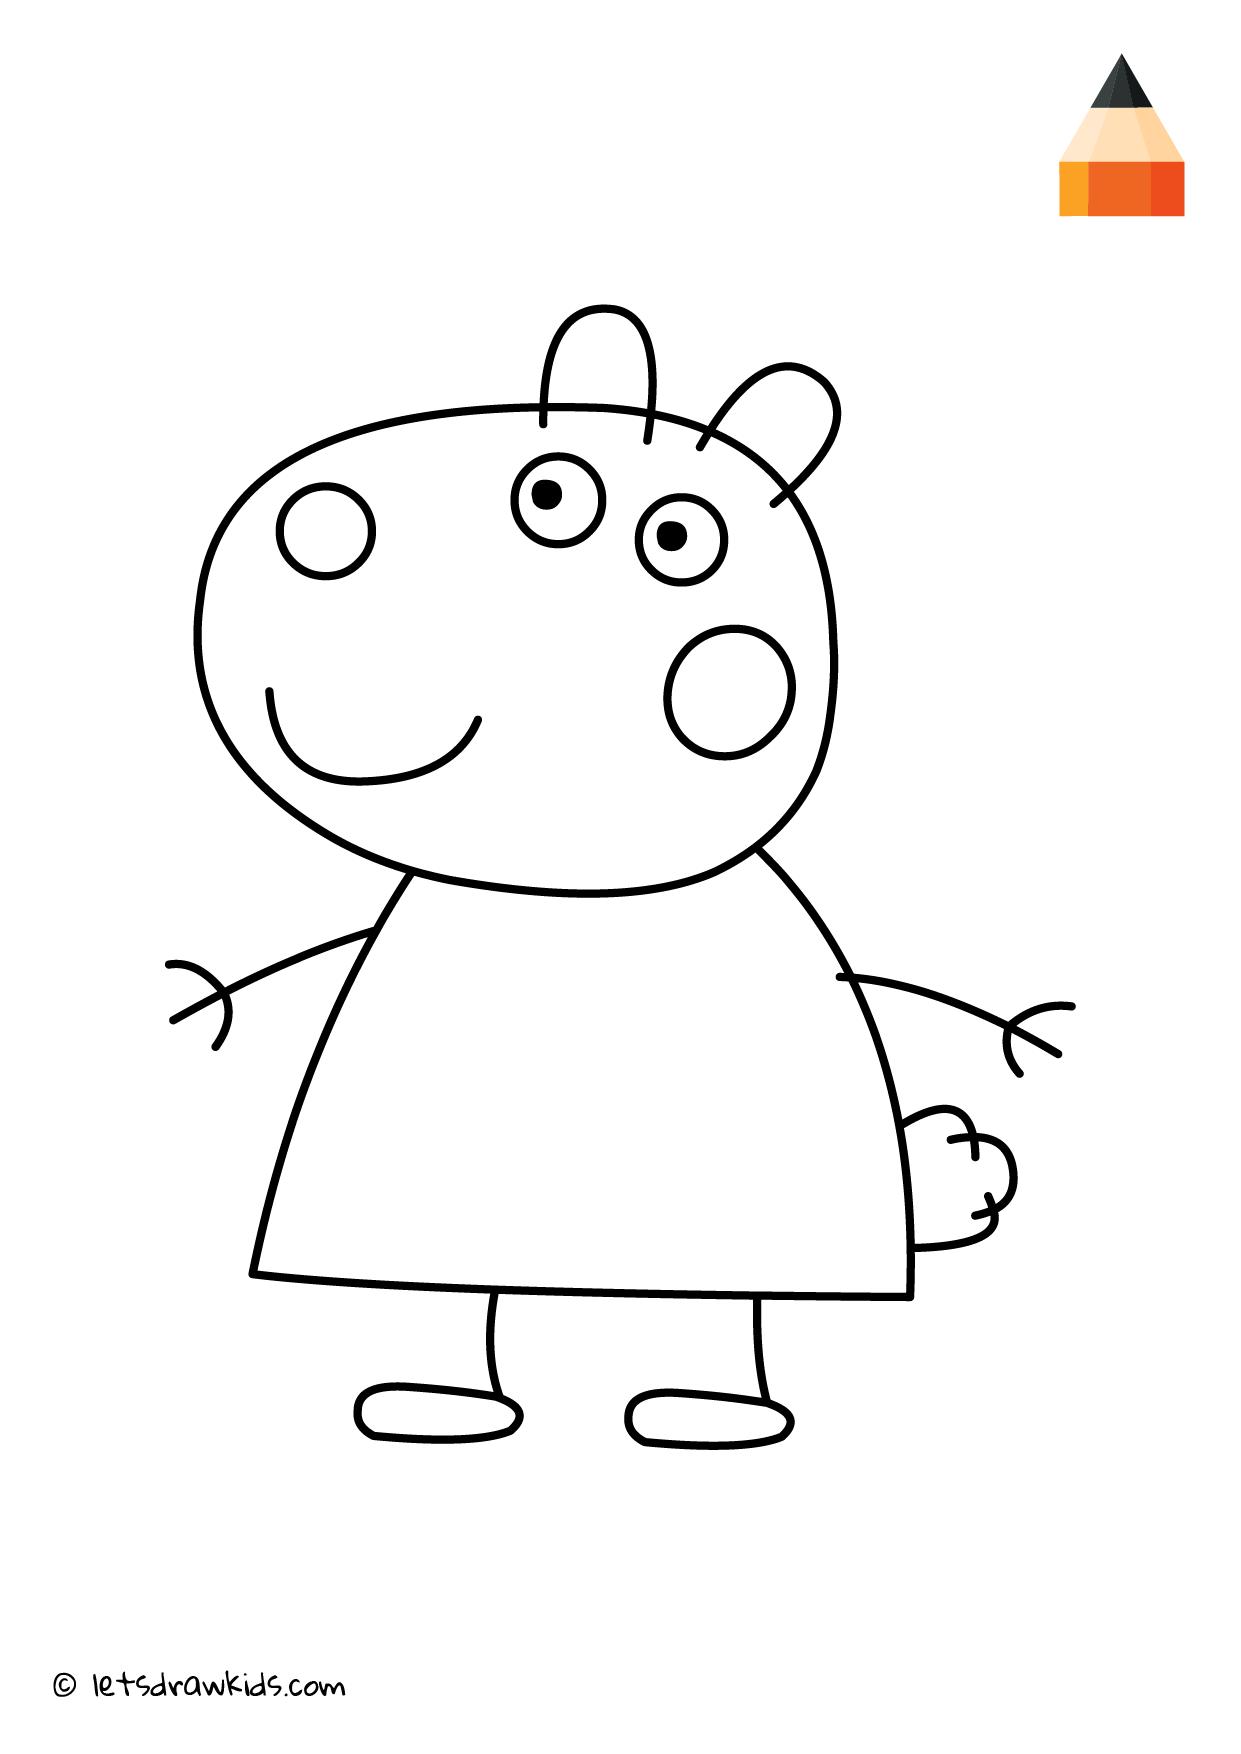 Coloring Page Peppa Pig Suzy Sheep Peppa Pig Drawing Peppa Pig Coloring Pages Pig Character